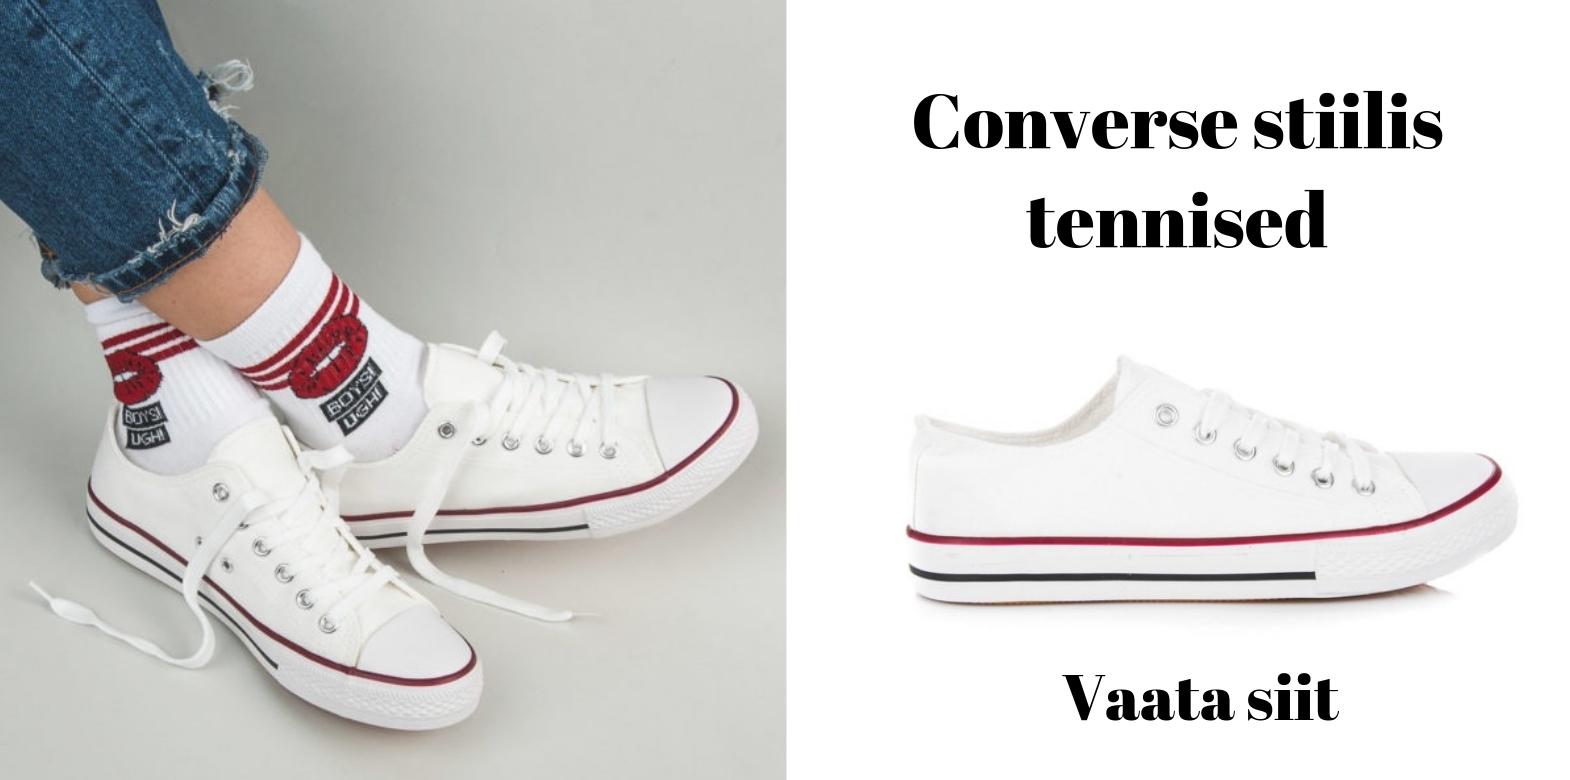 Converse tennised